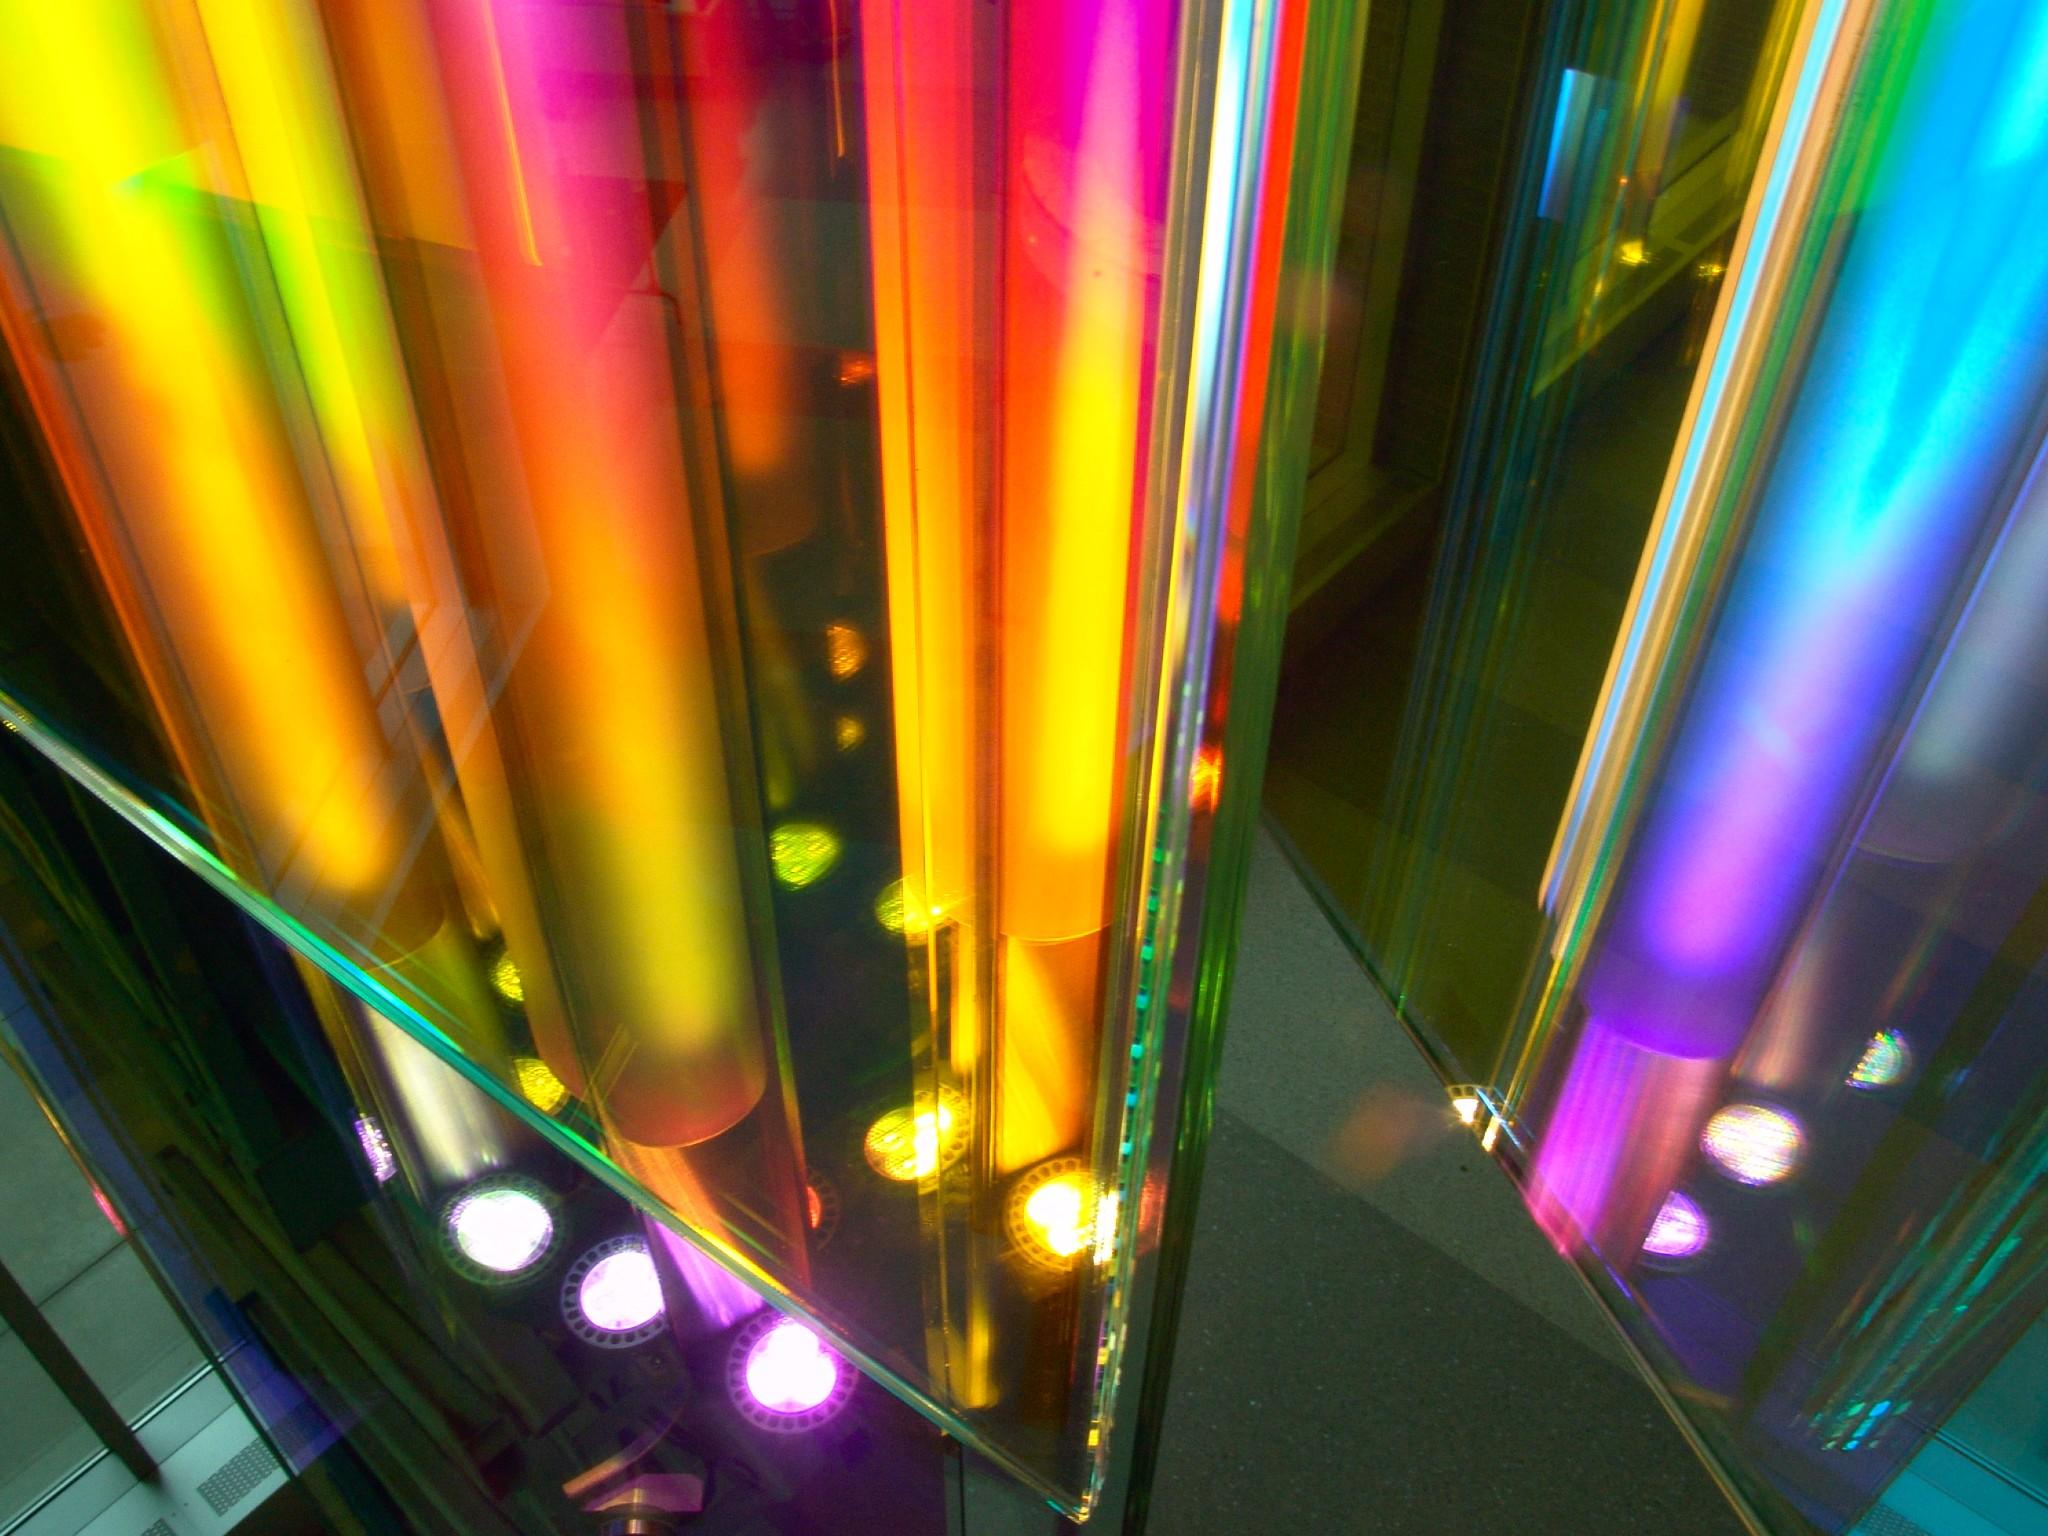 Lightcicles